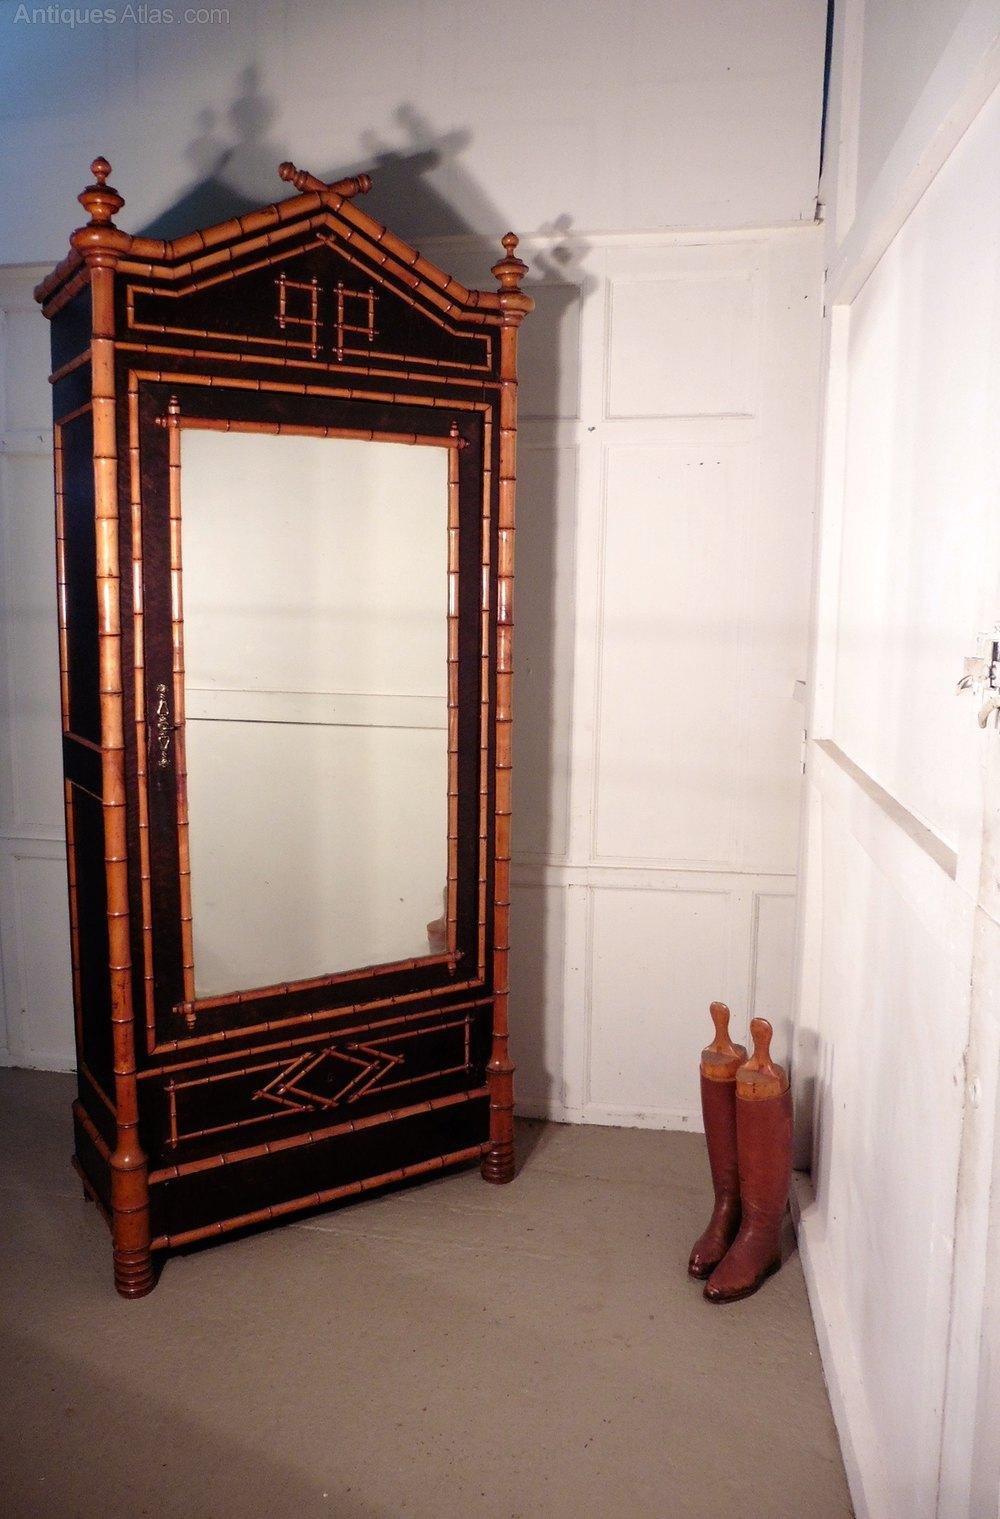 Bamboo Vitrine Armoire Wardrobe Display Cabinet Antiques